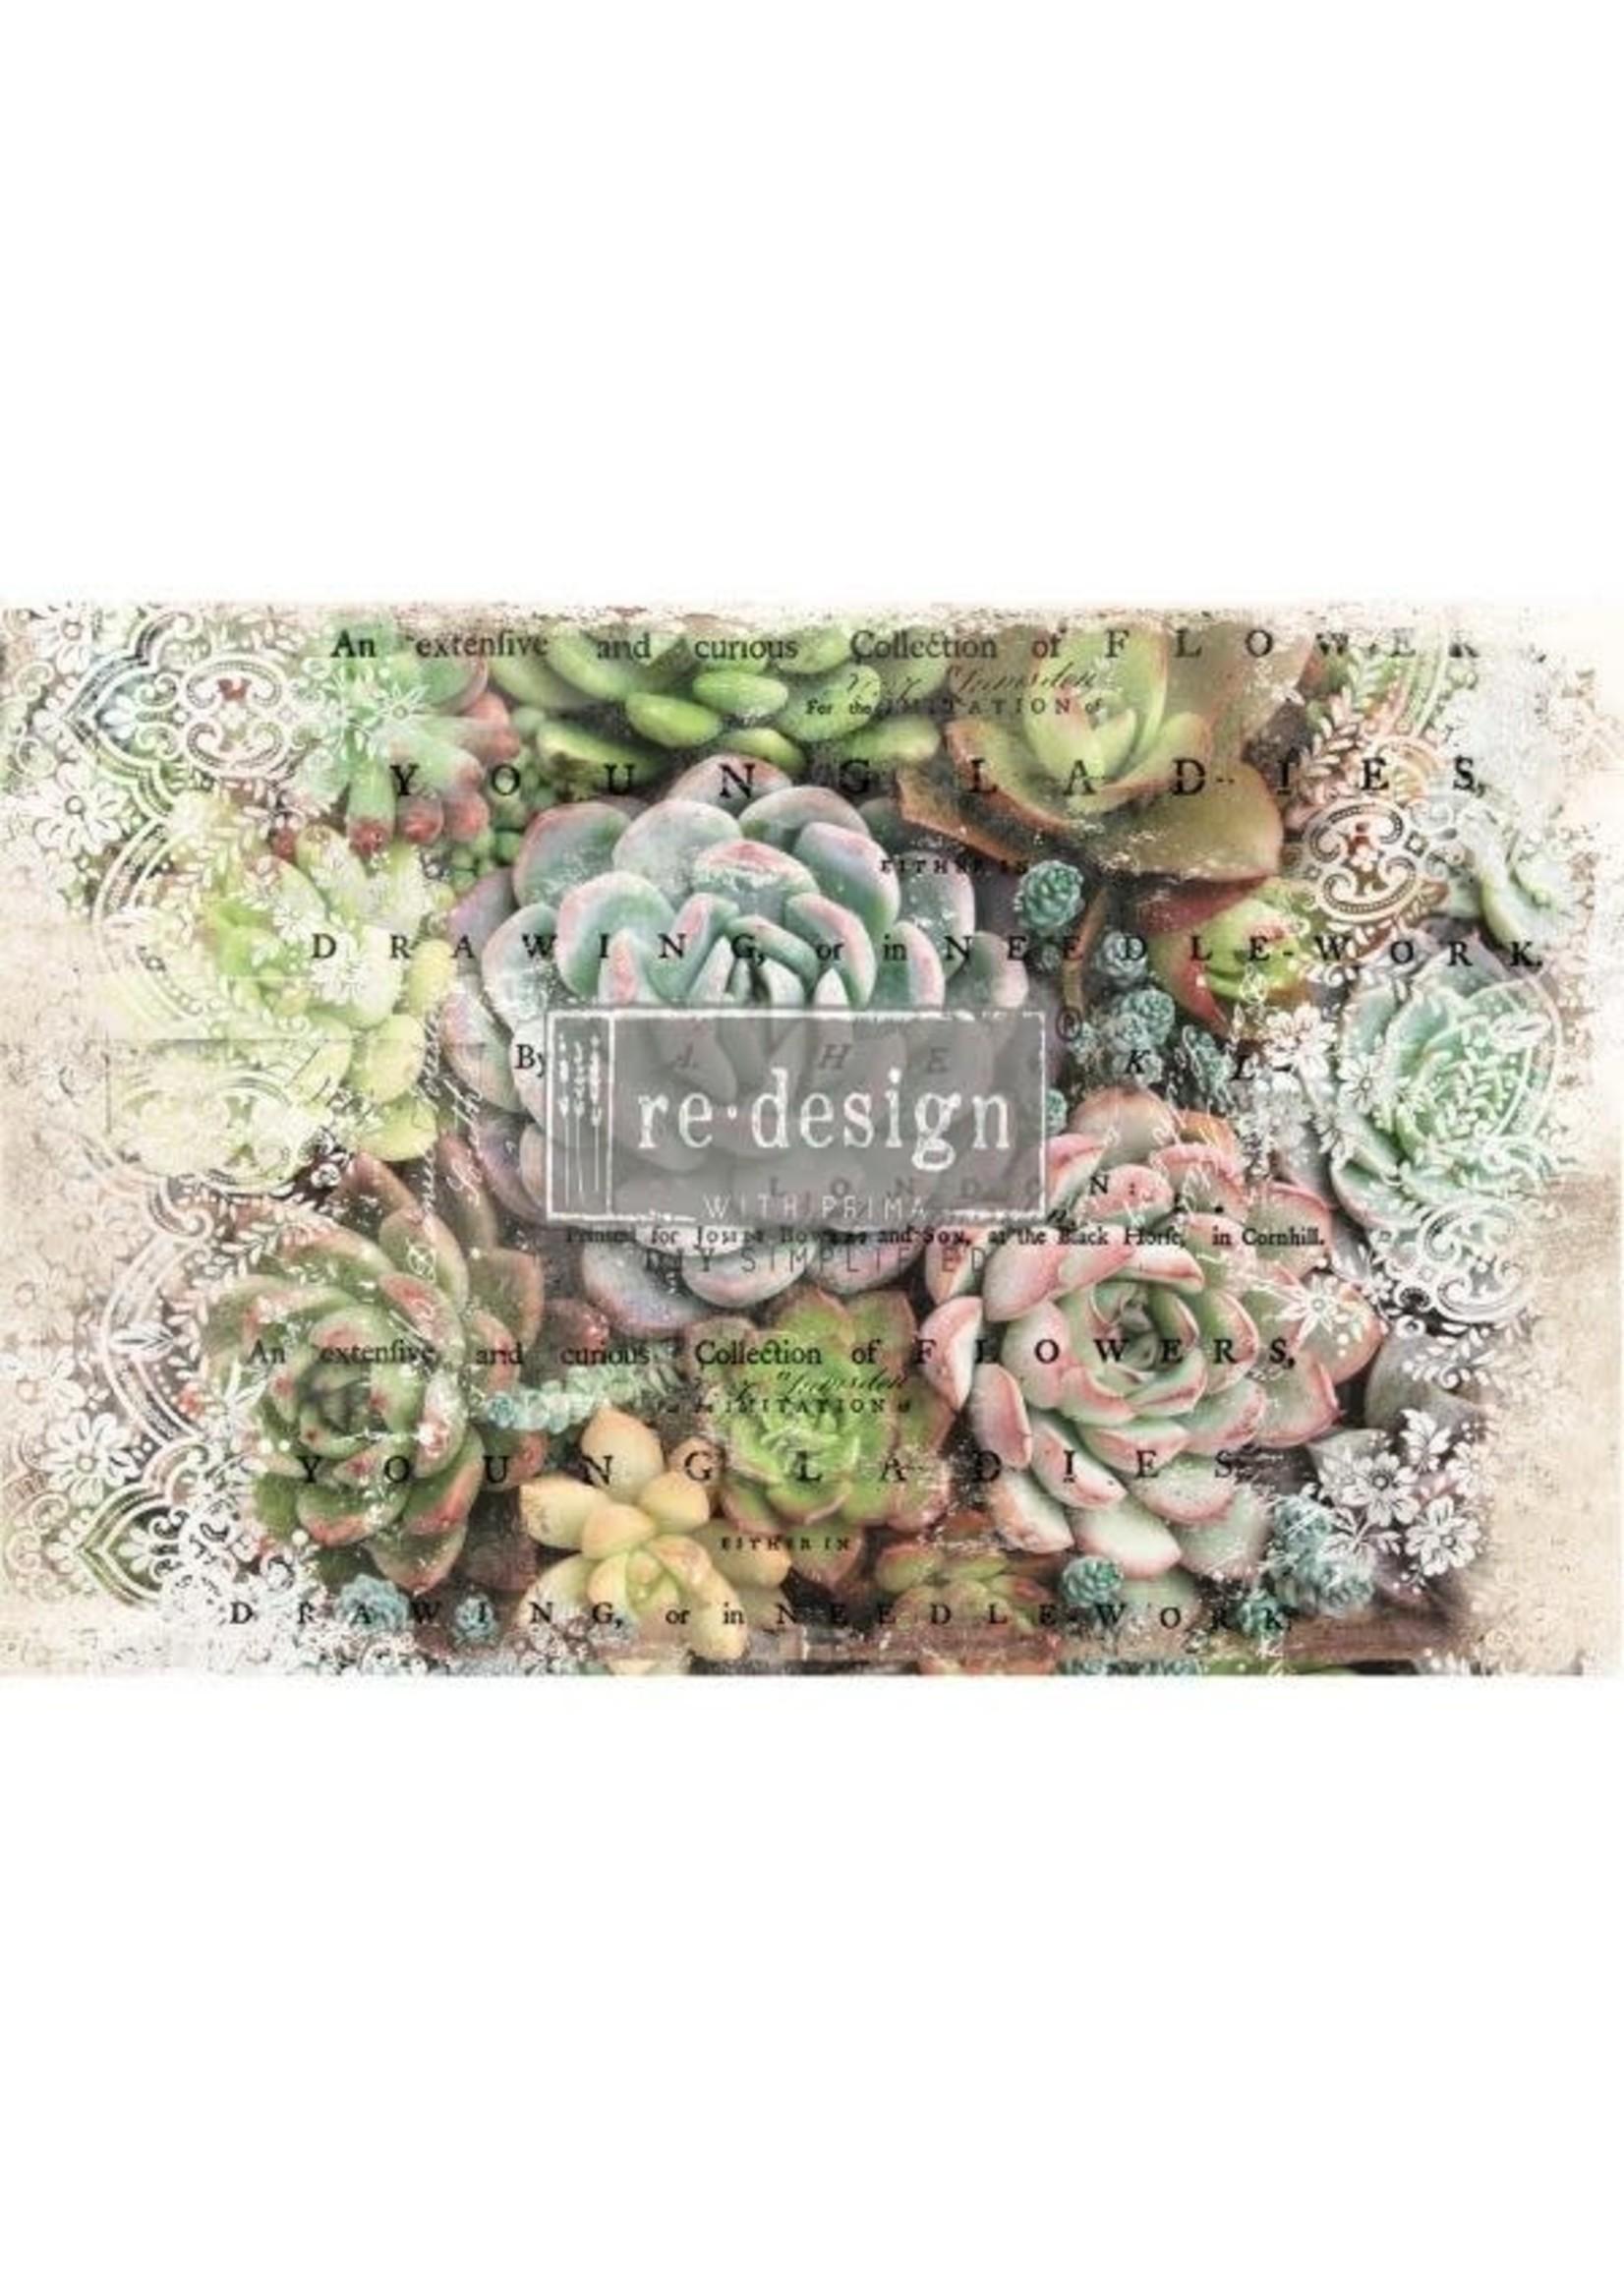 Re-Design with Prima® Zuri Re·Design with Prima® Decoupage Tissue Paper